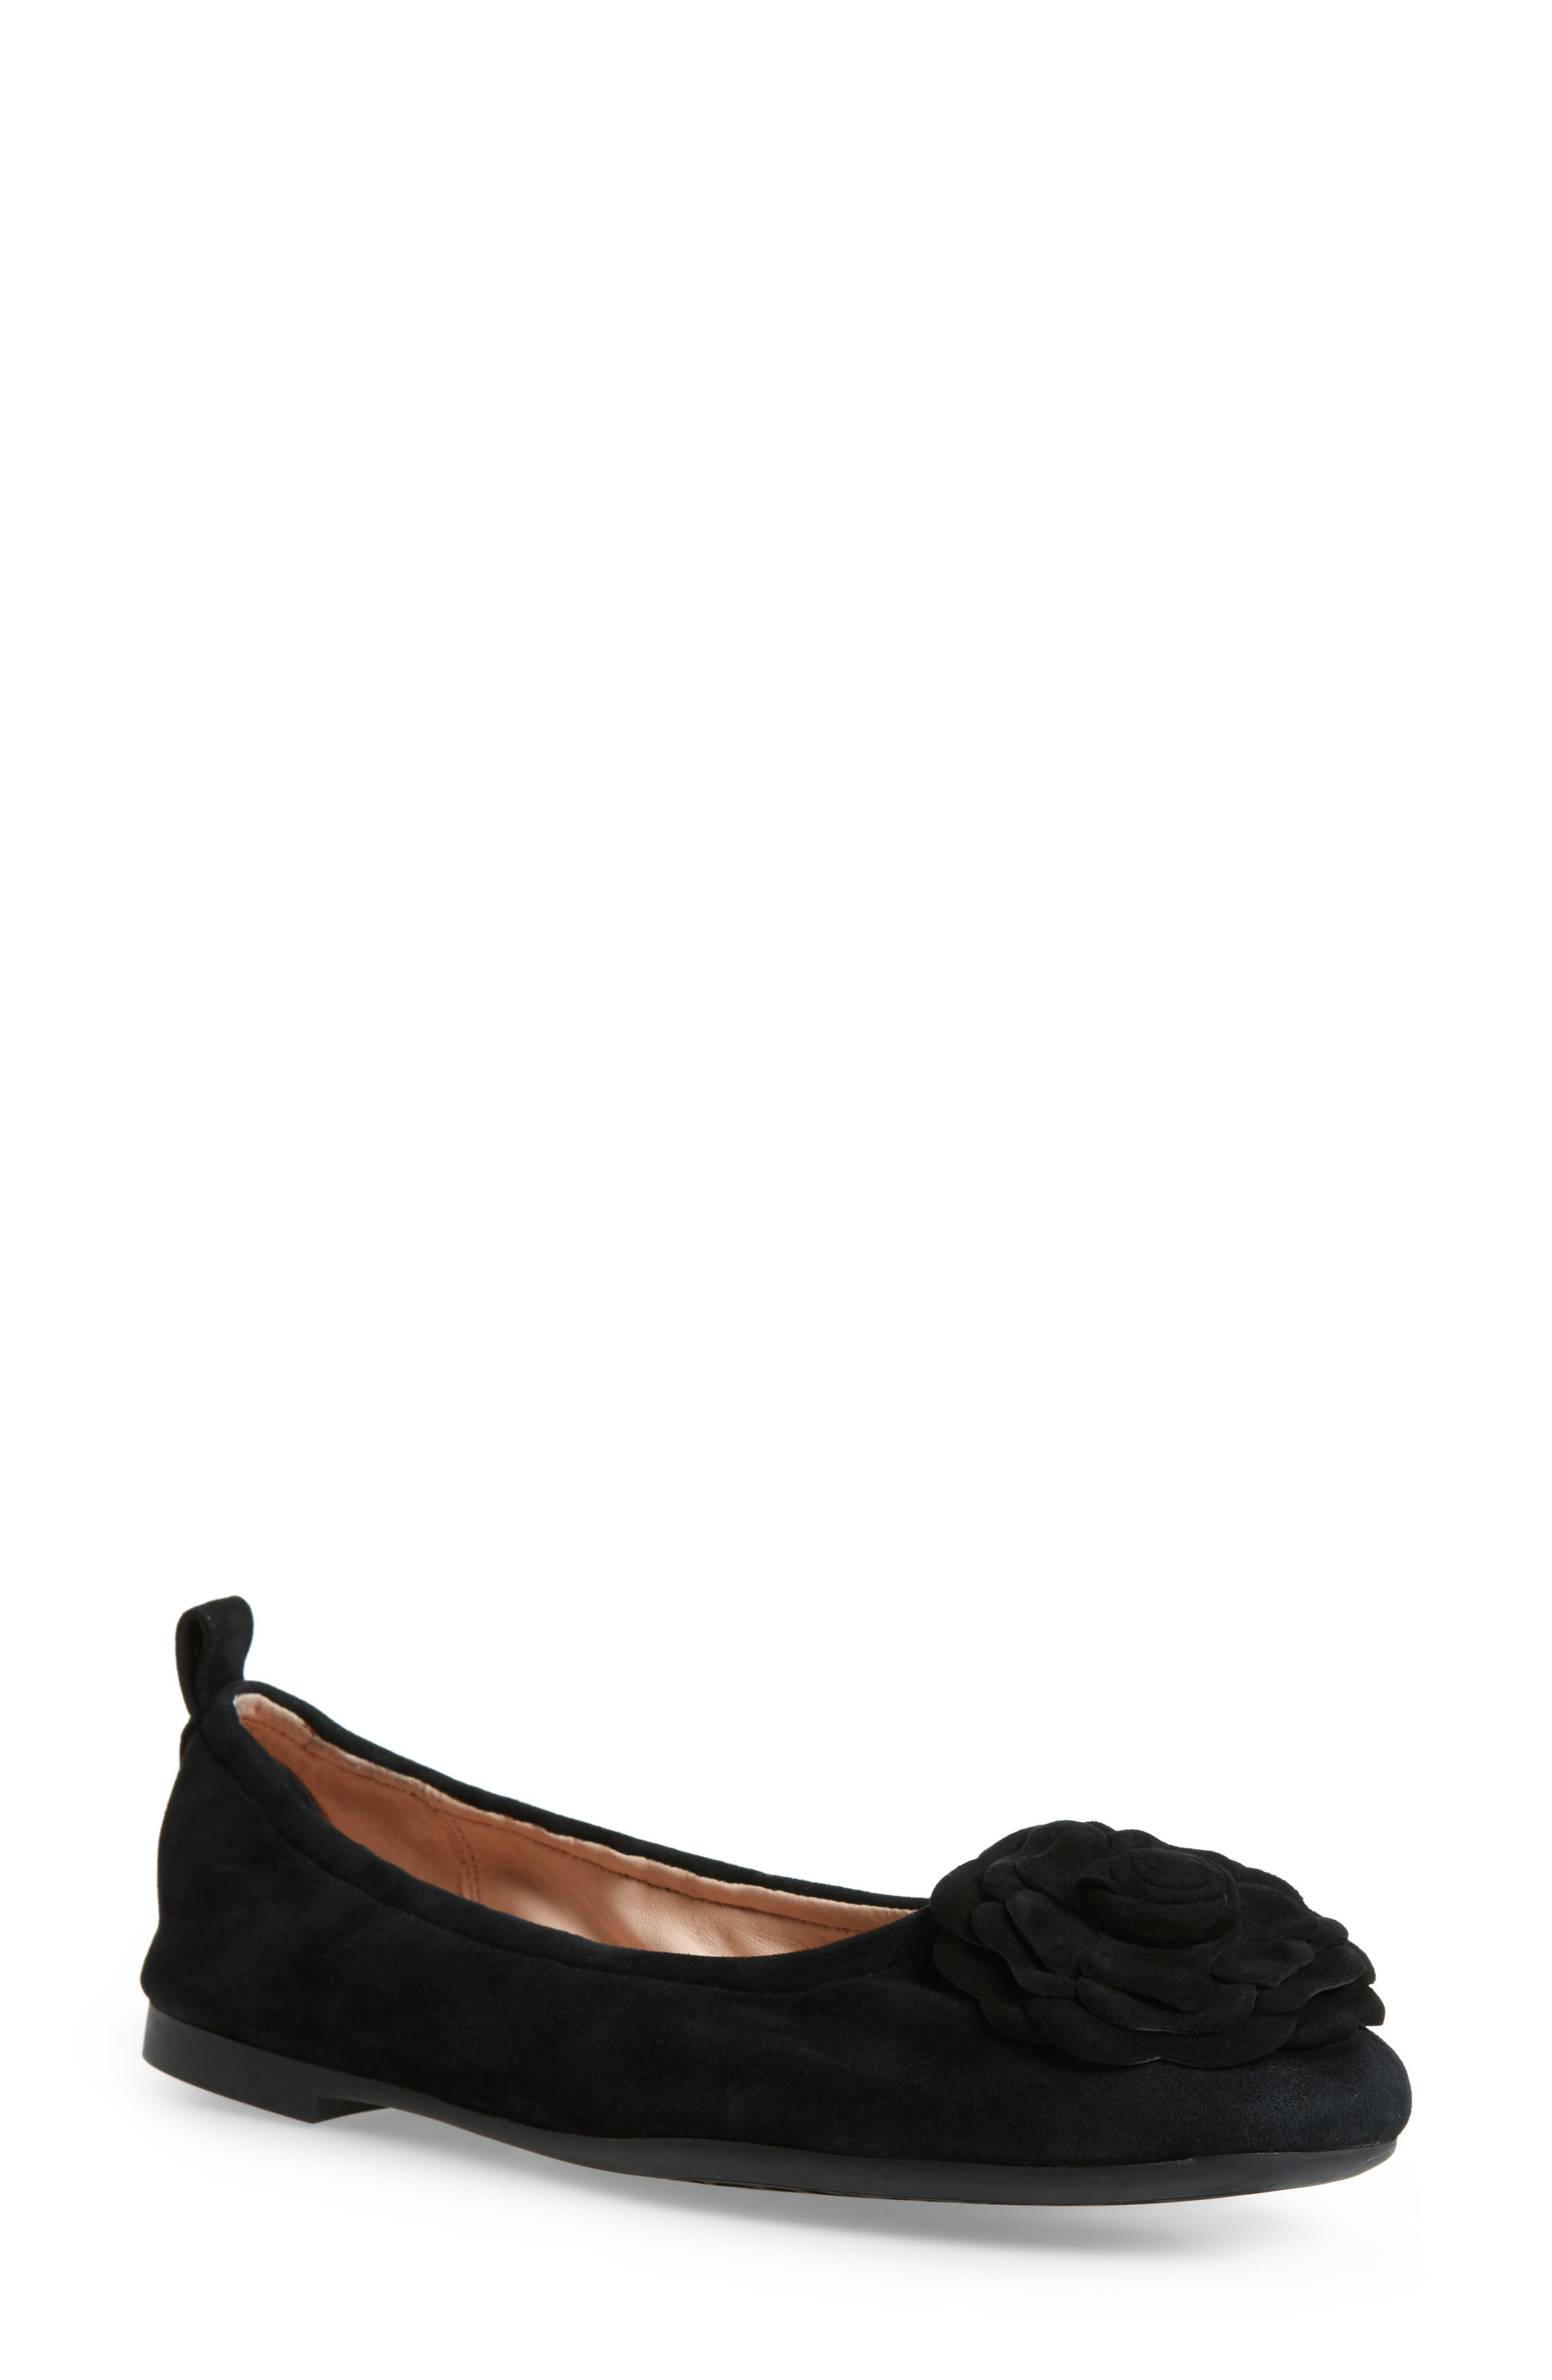 Rosalyn Ballet Flat,                         Main,                         color, BLACK SUEDE